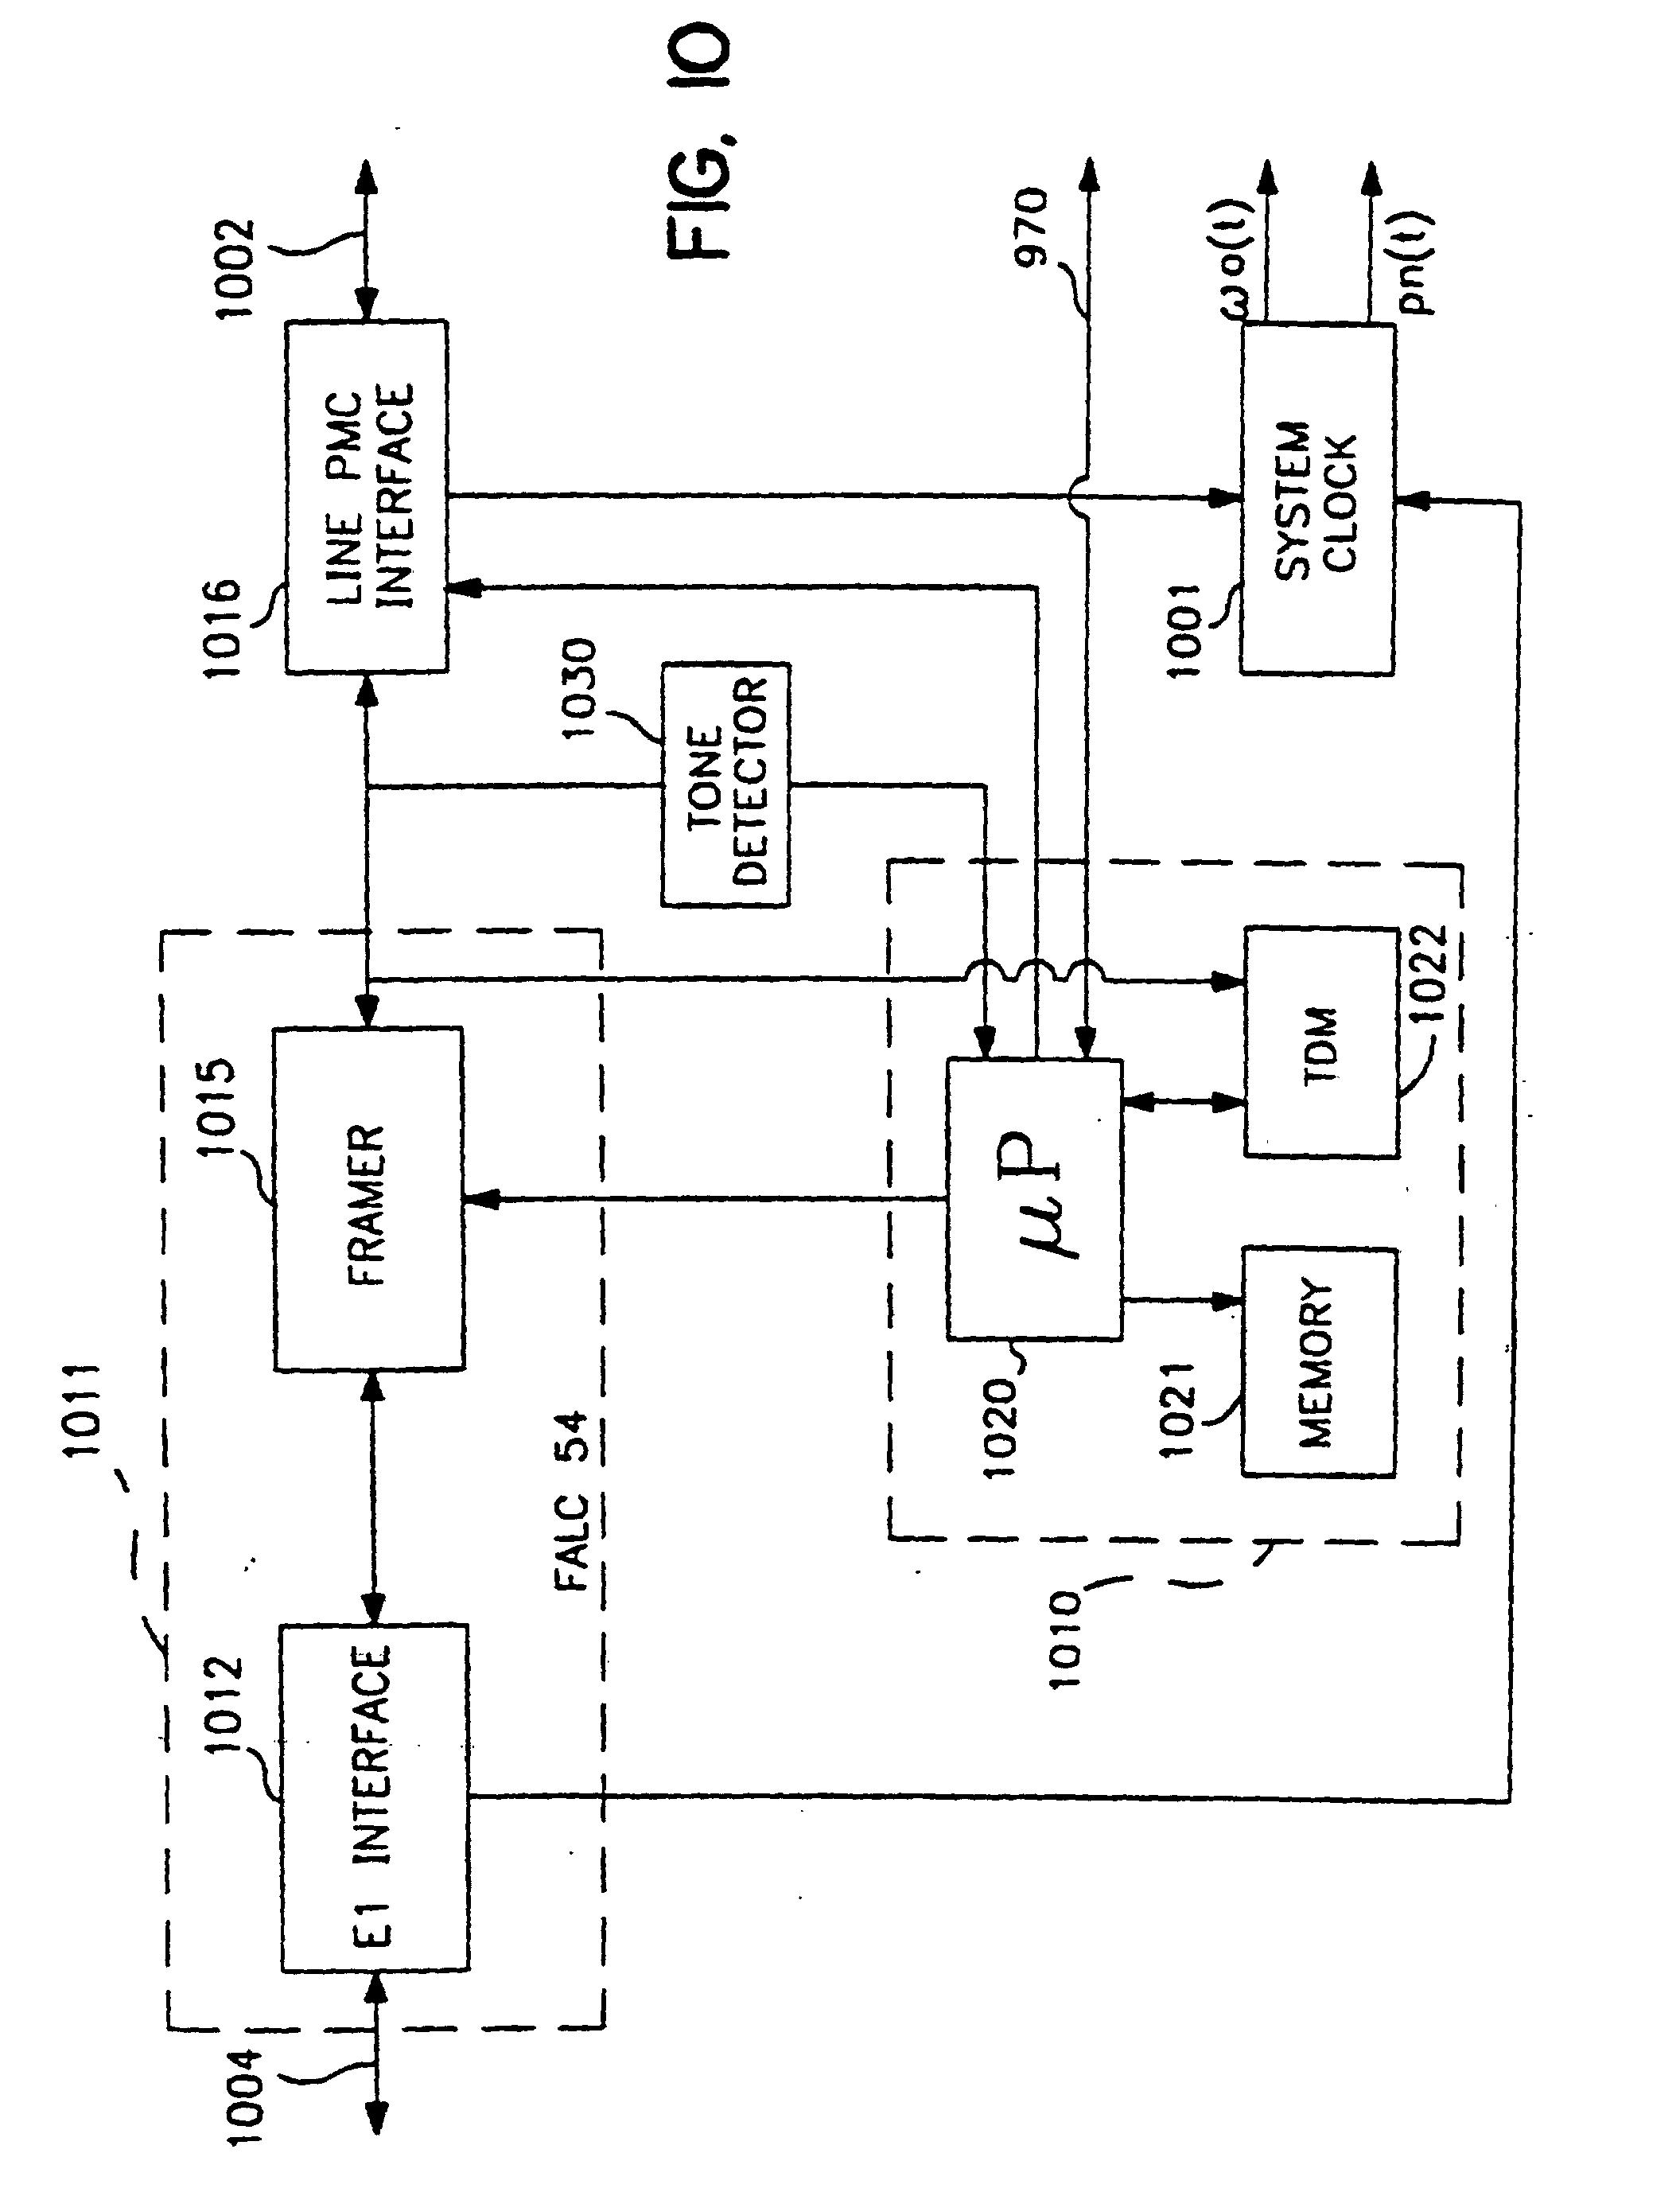 Wiring Diagram Besides 2390 Case Tractor Wiring Diagram Besides Case